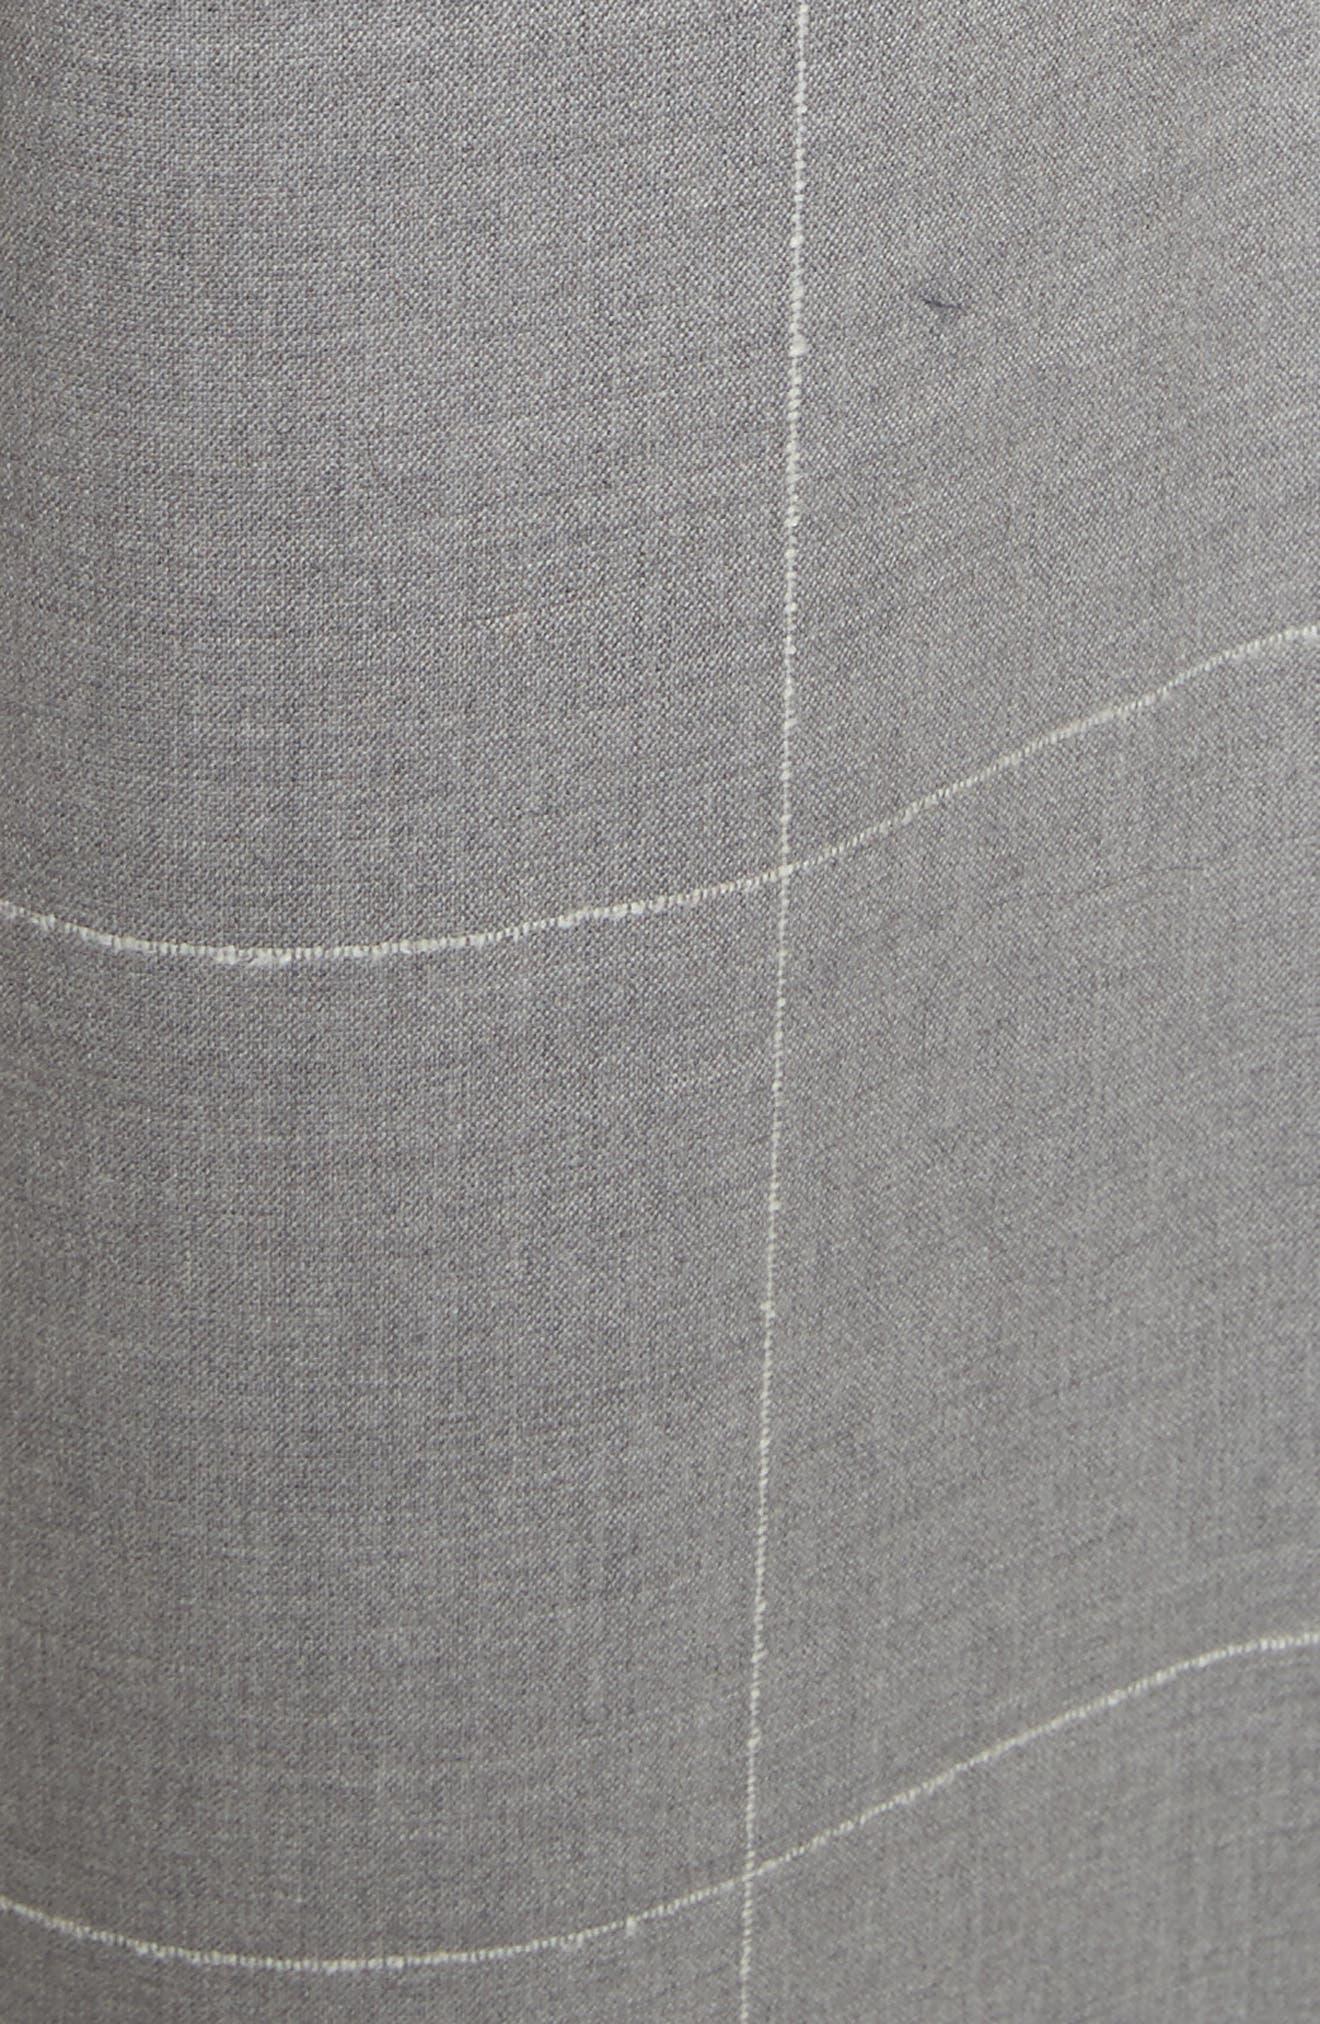 Windowpane Check Wool Wide Leg Crop Pants,                             Alternate thumbnail 5, color,                             062